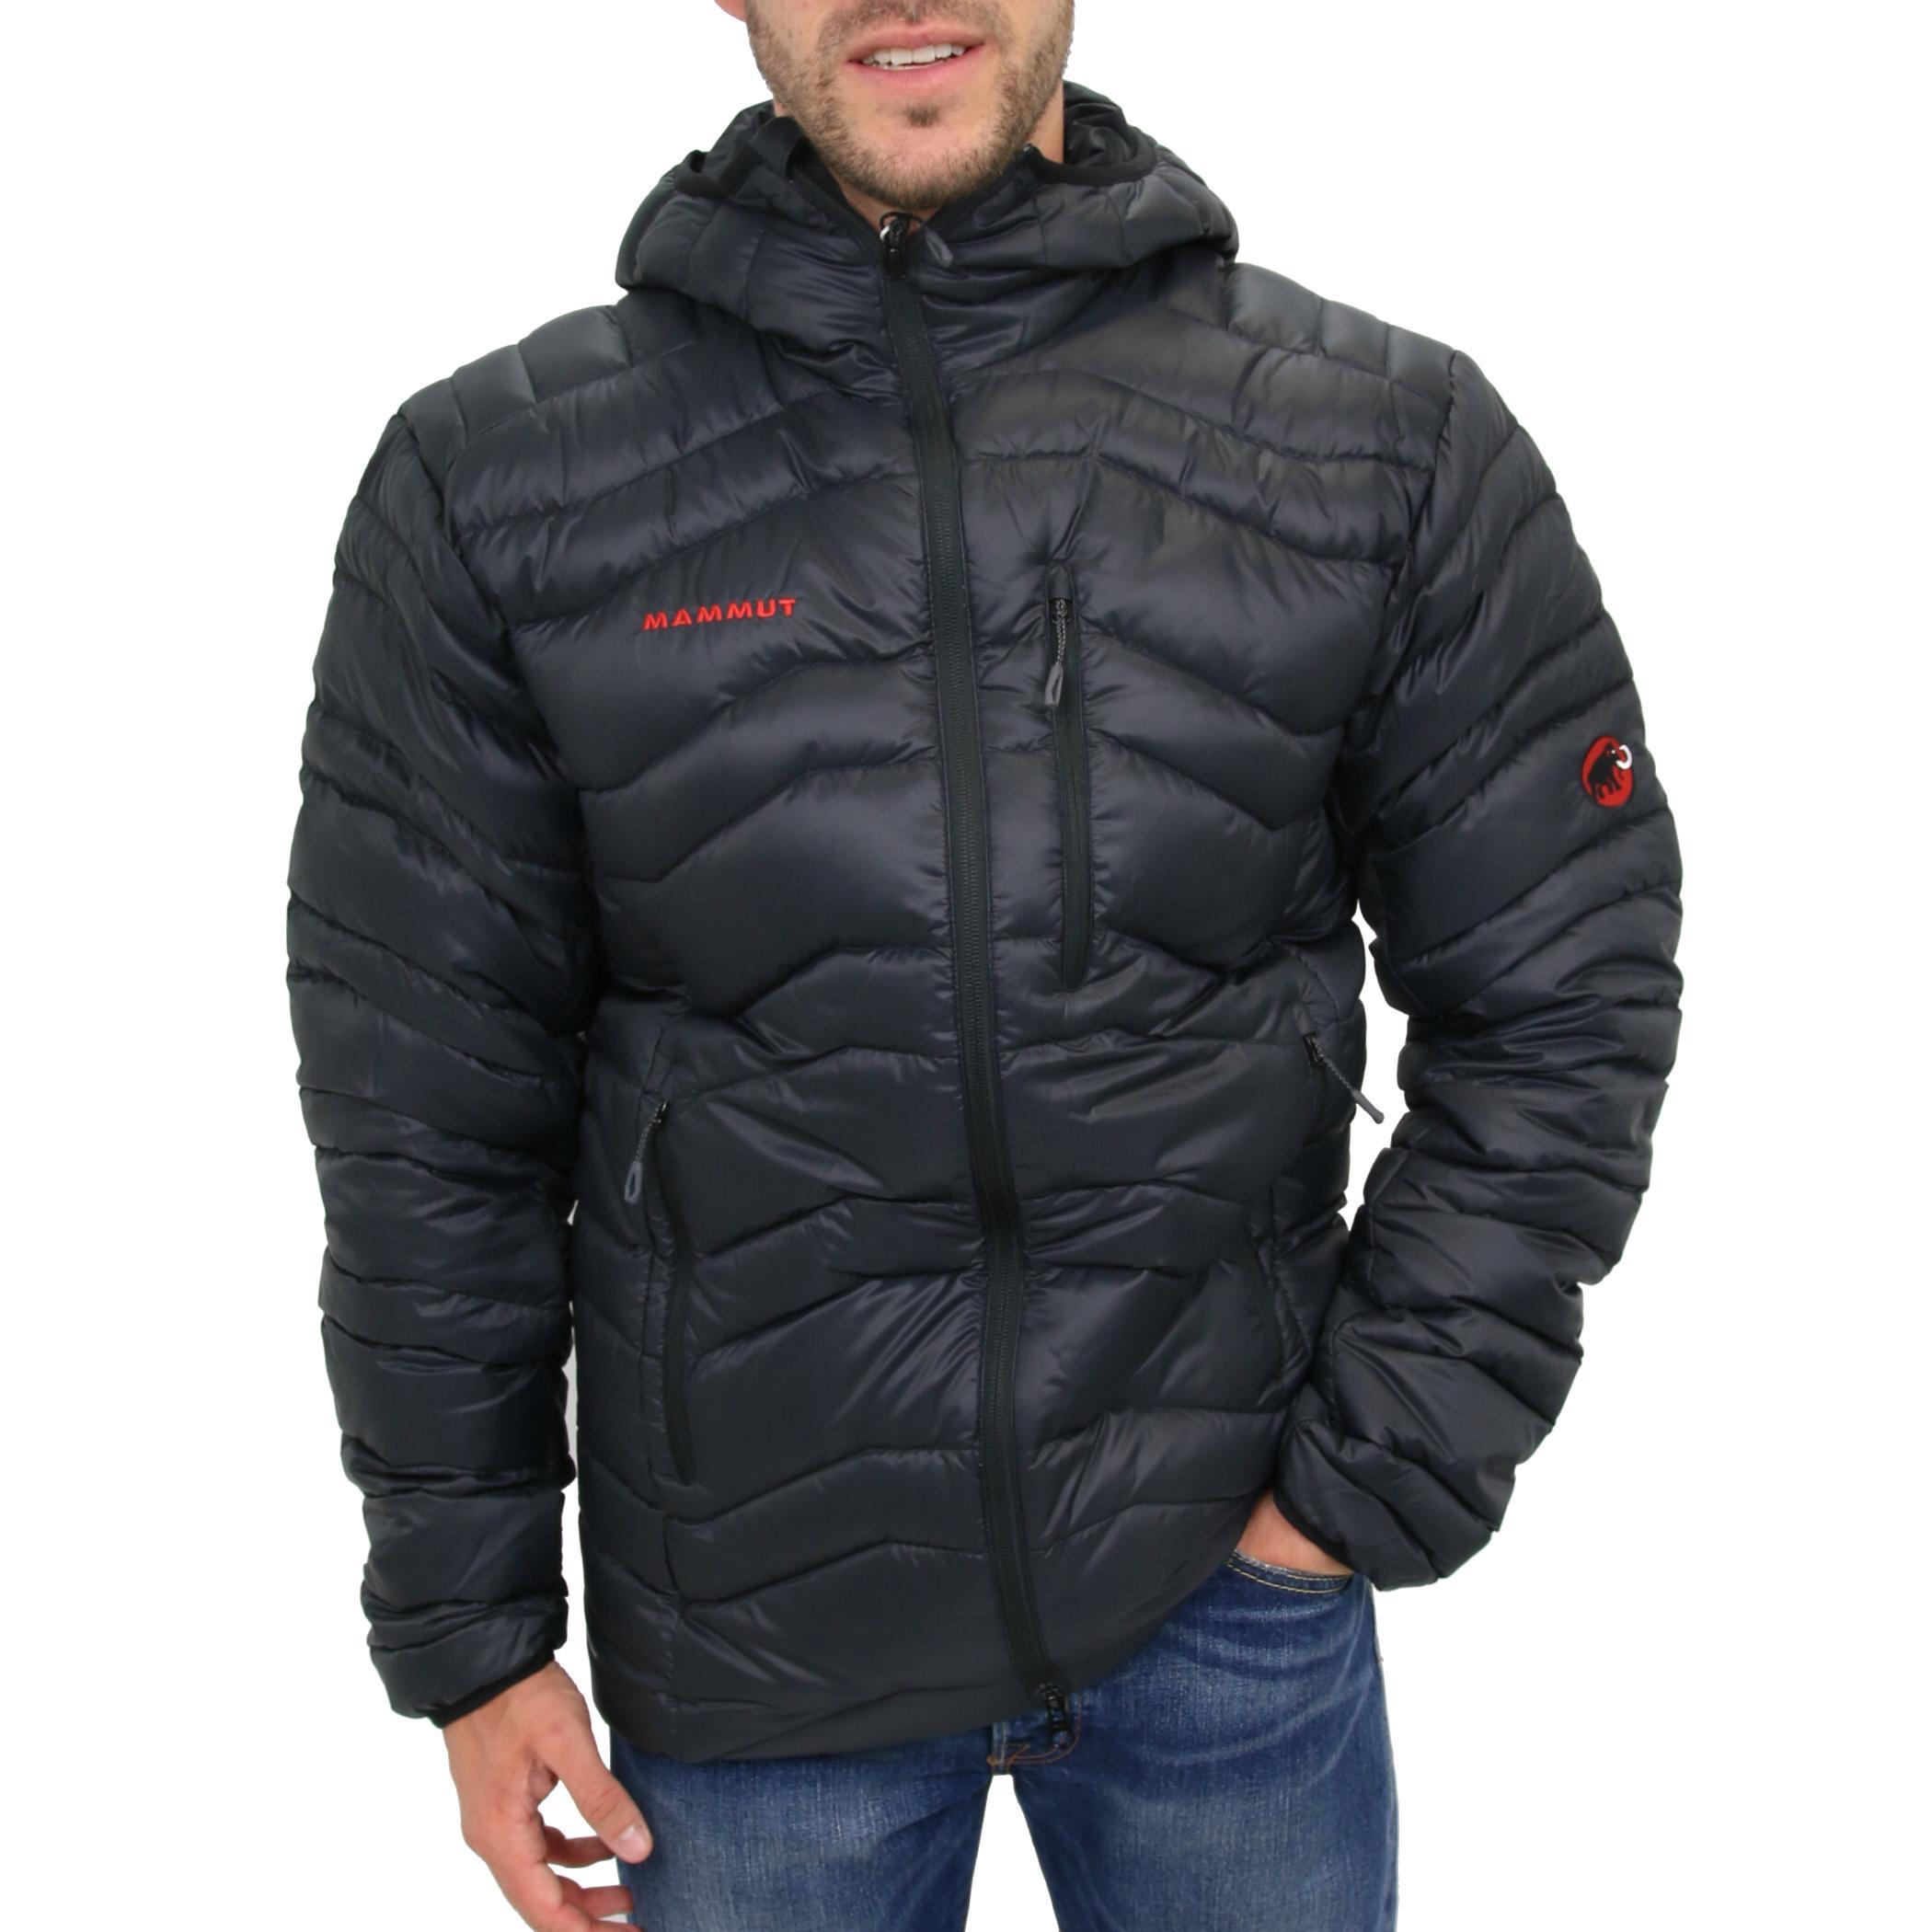 mammut broad peak in hooded jacket black jacke winterjacke kapuze herren schwarz ebay. Black Bedroom Furniture Sets. Home Design Ideas